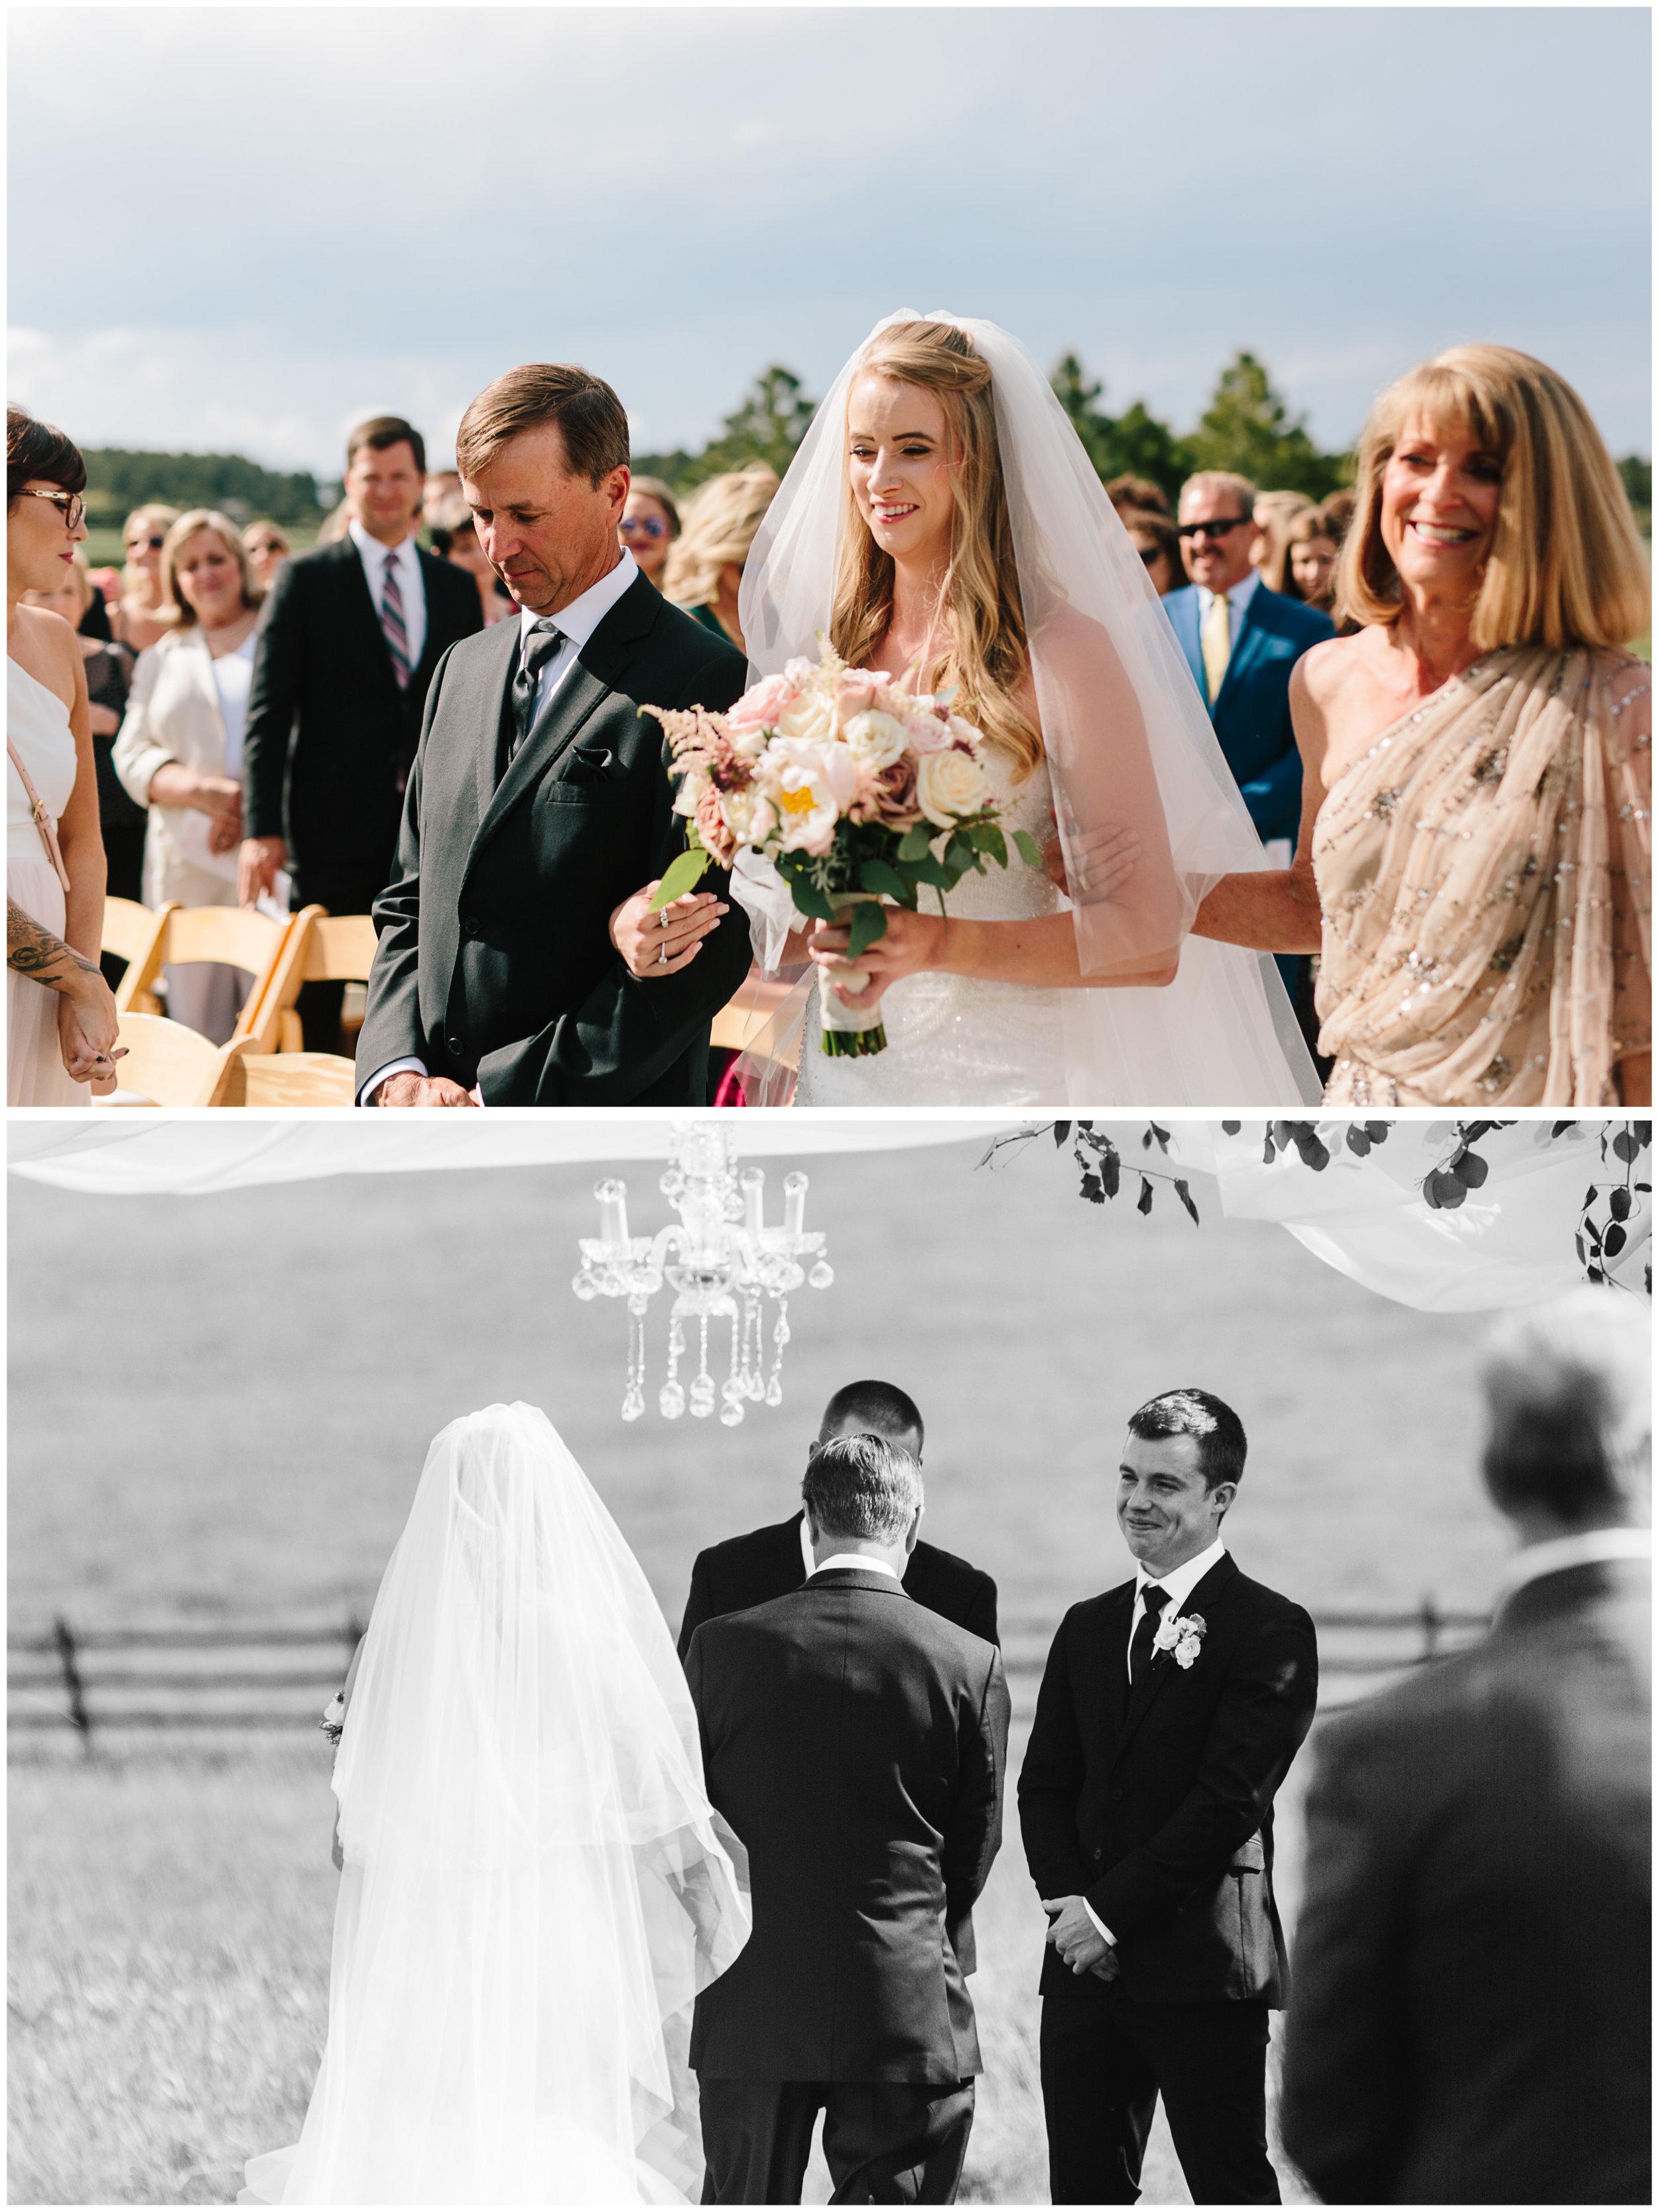 spruce_mountain_ranch_wedding_27.jpg